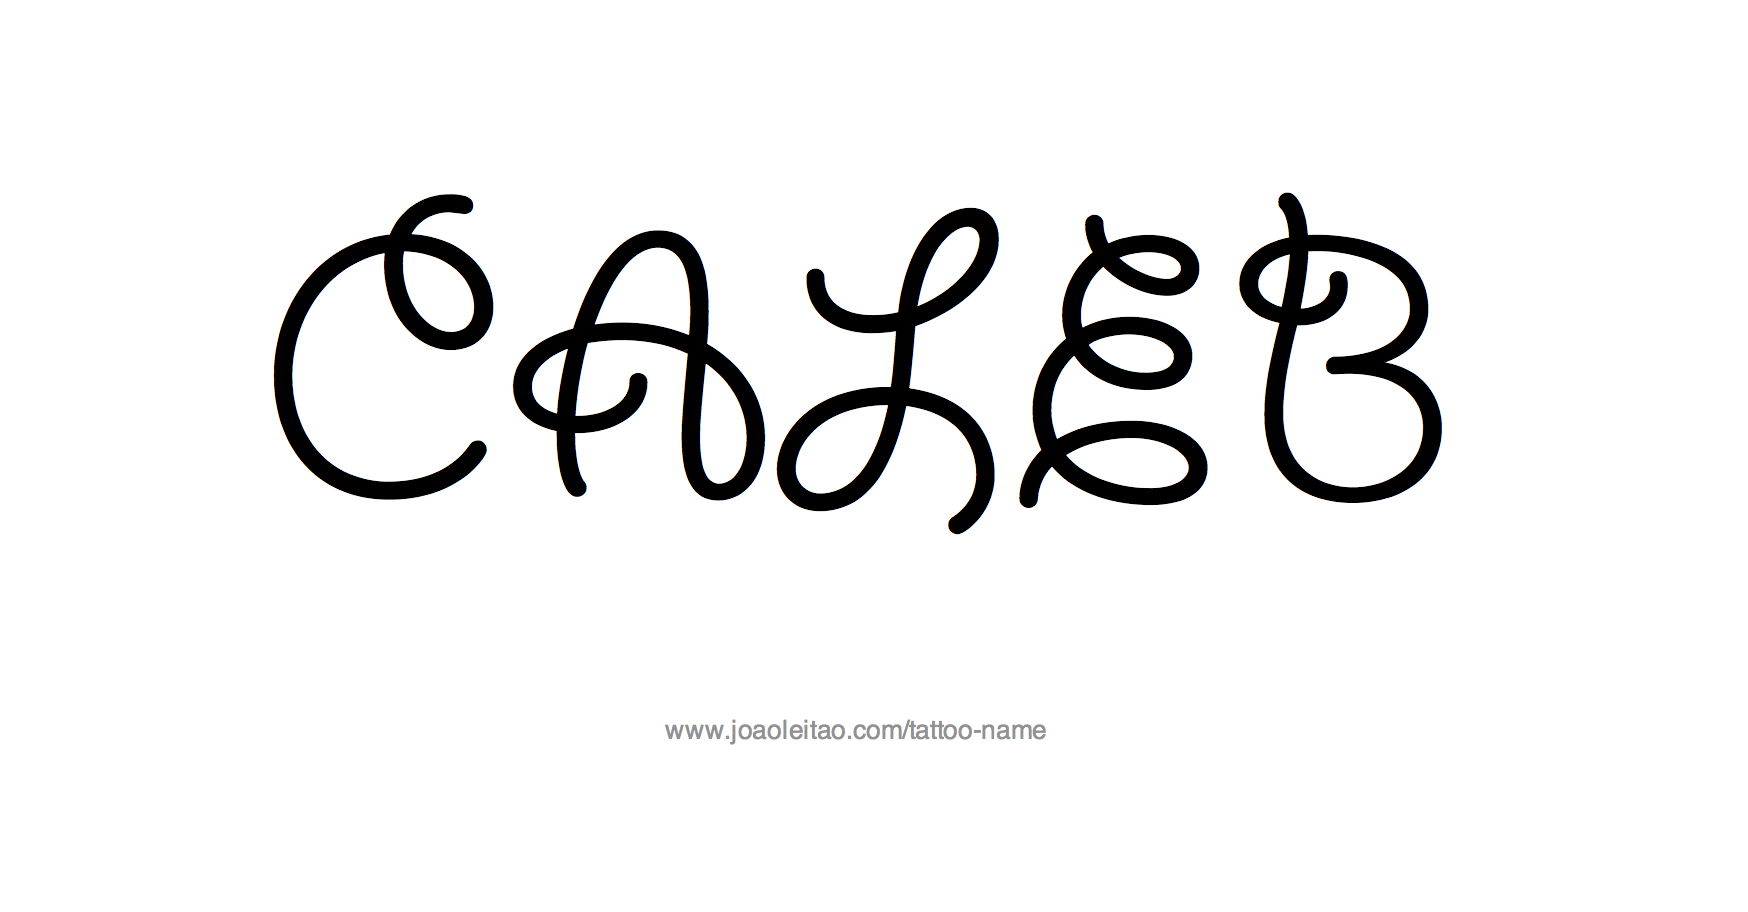 Tattoo Design Name Caleb